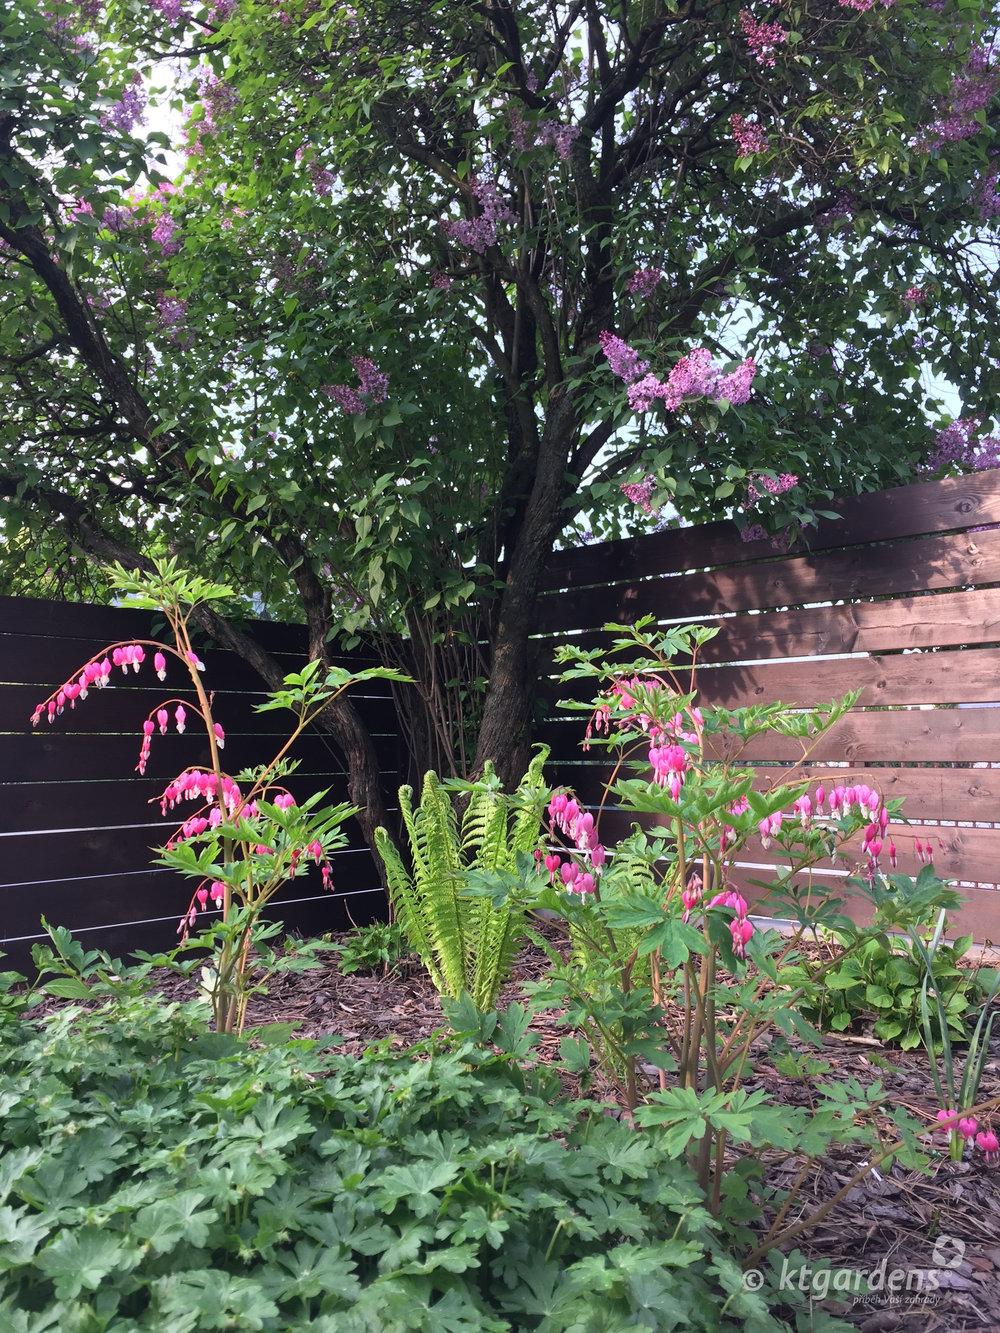 zahrada v Zelinkovicích, ktgardens, Monika Kořená, stinná zahrada